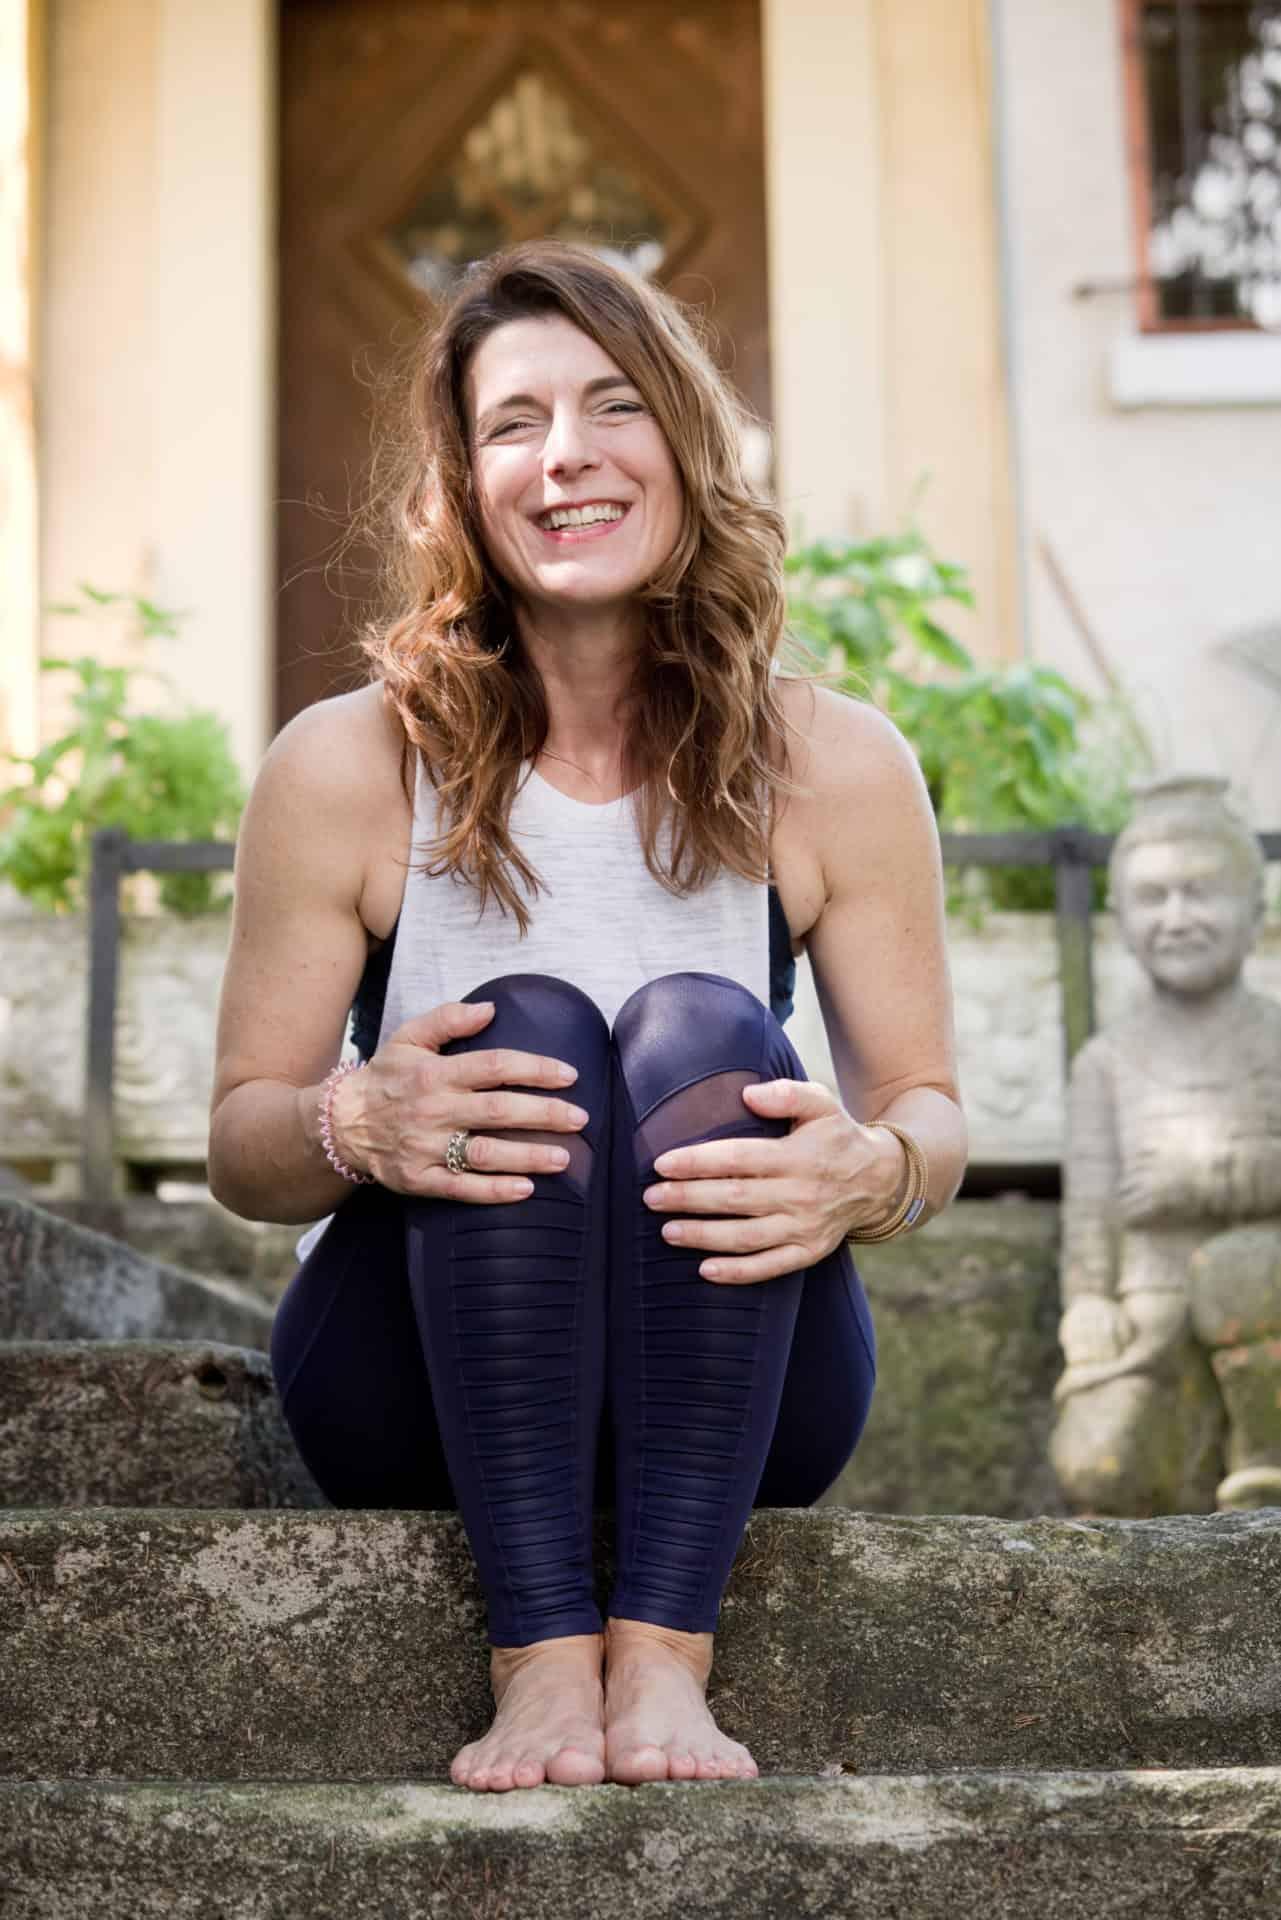 Yogamanufaktur_Wuerzburg_Manuela_Mueller_Yogafreude